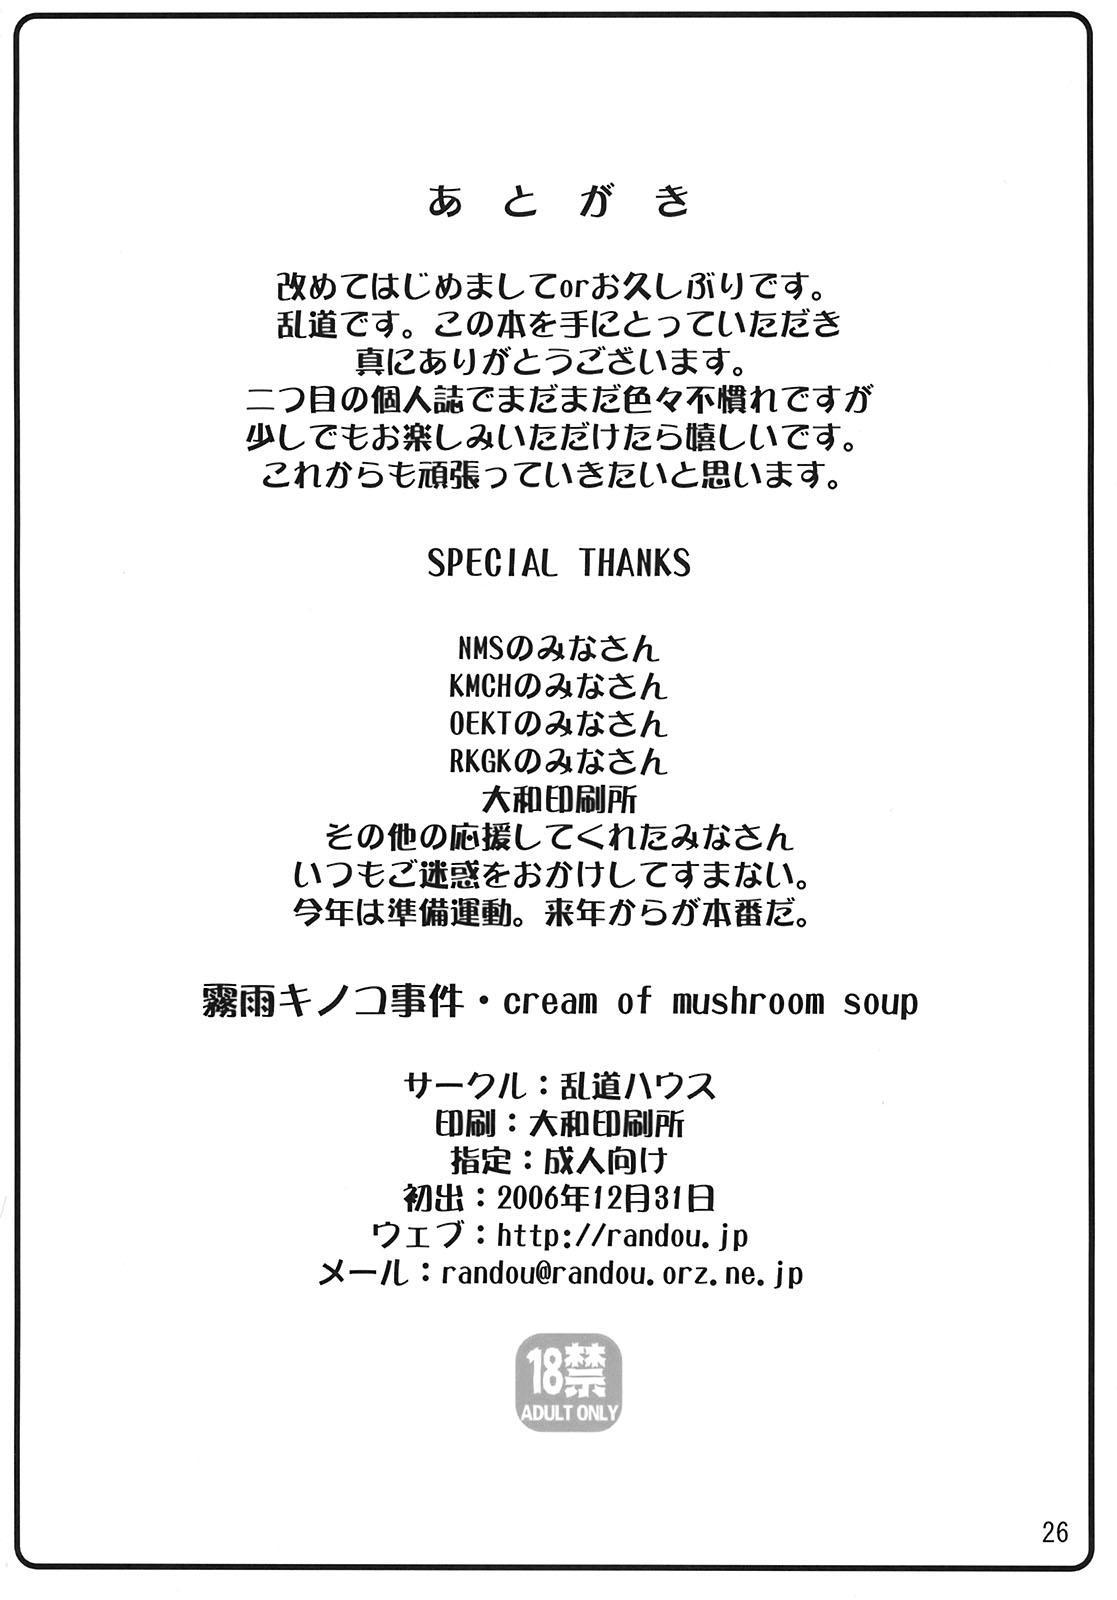 Kirisame Kinoko Jiken - cream of mushroom soup 25